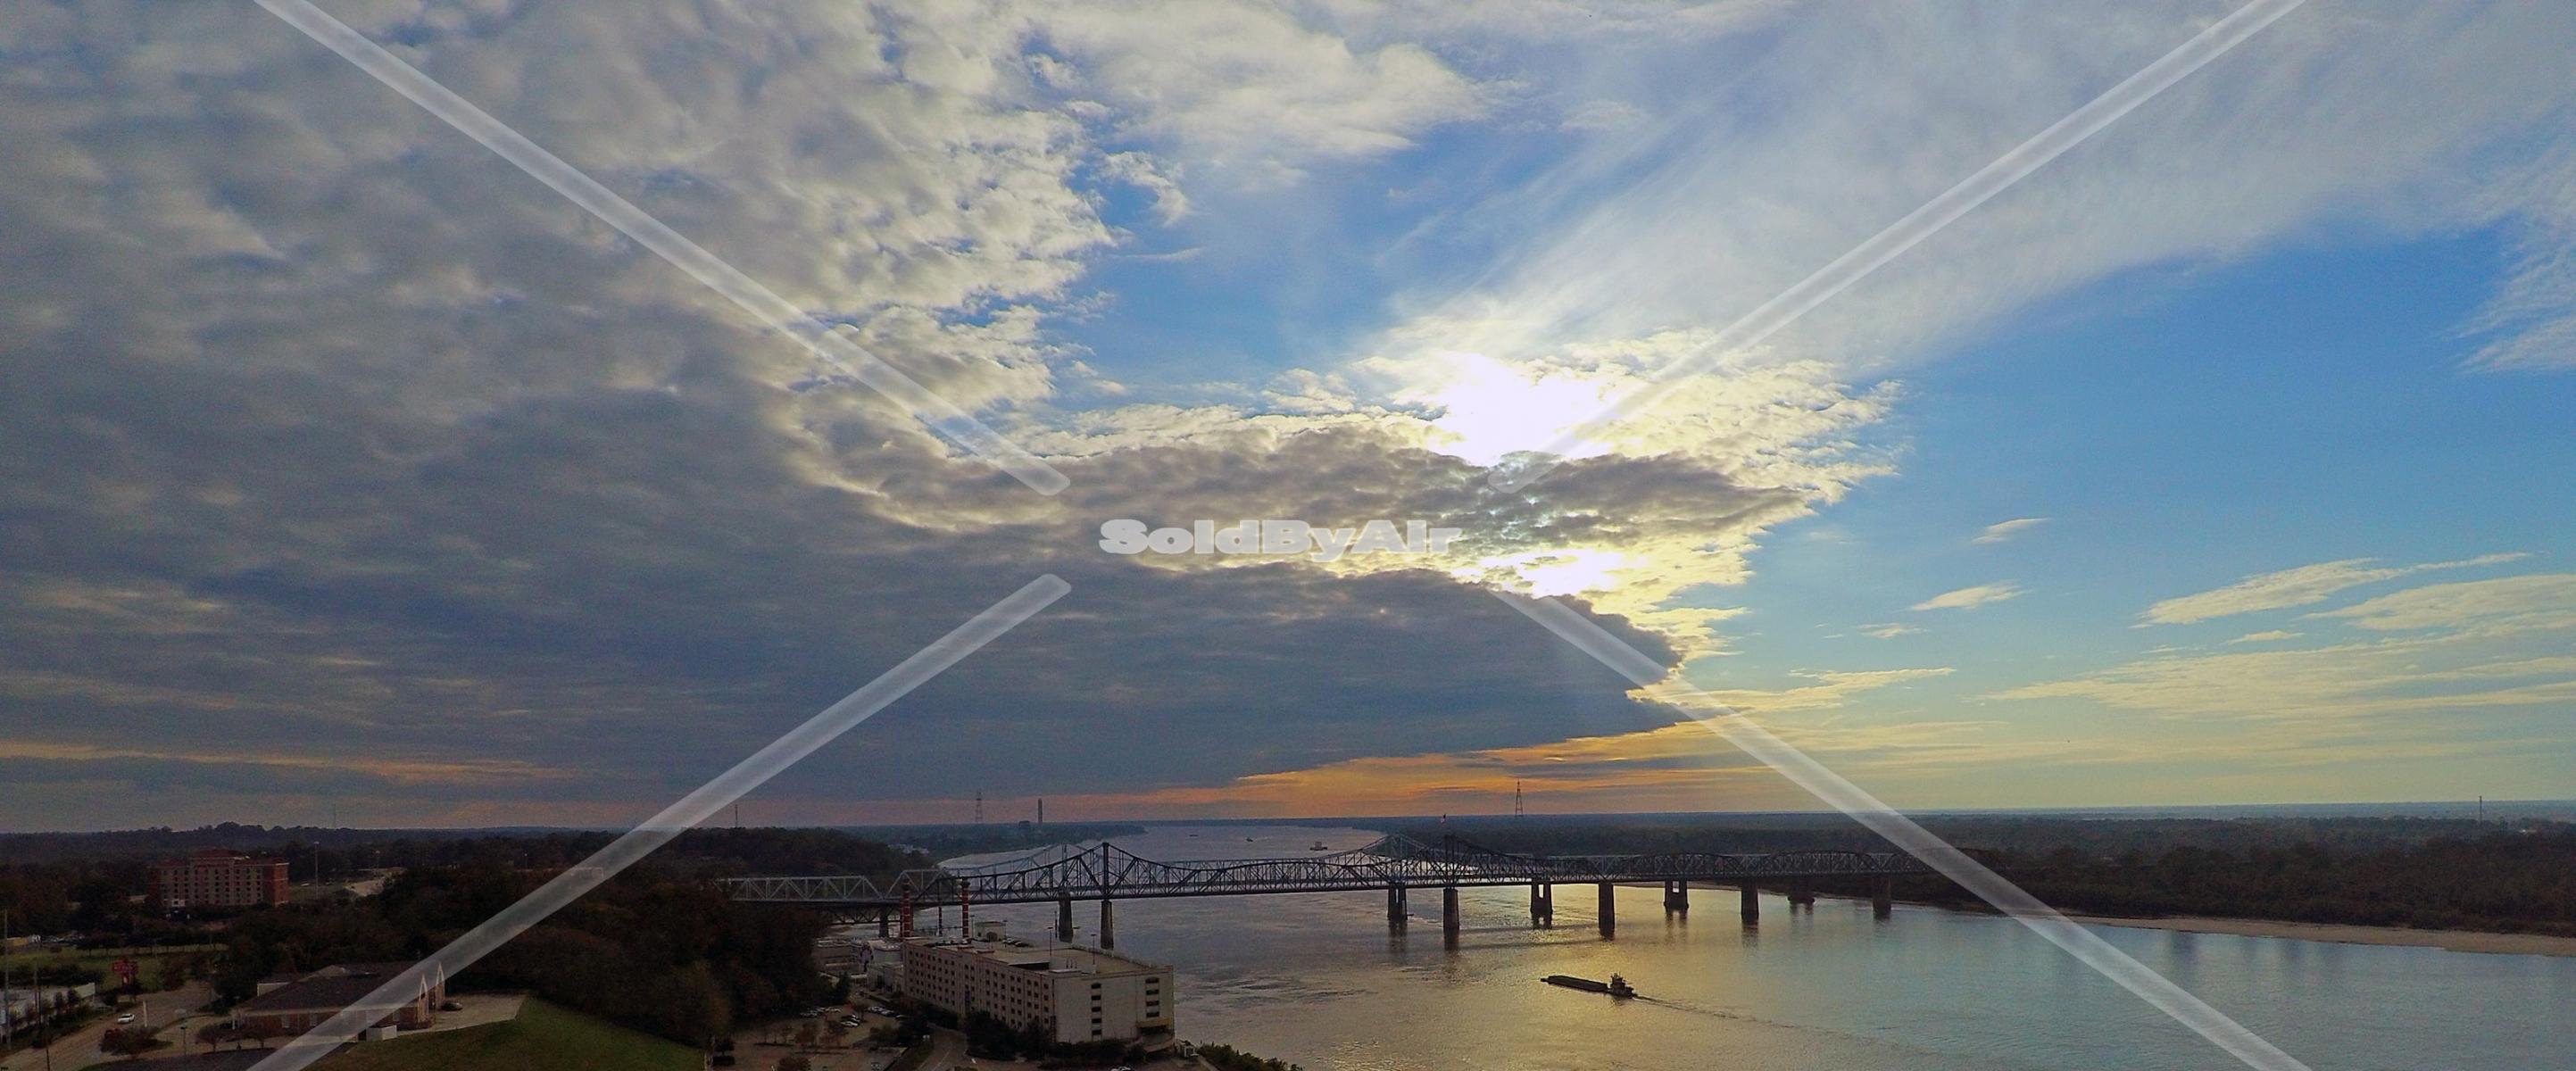 Drone Photo of Mississippi River in Vicksburg Mississippi